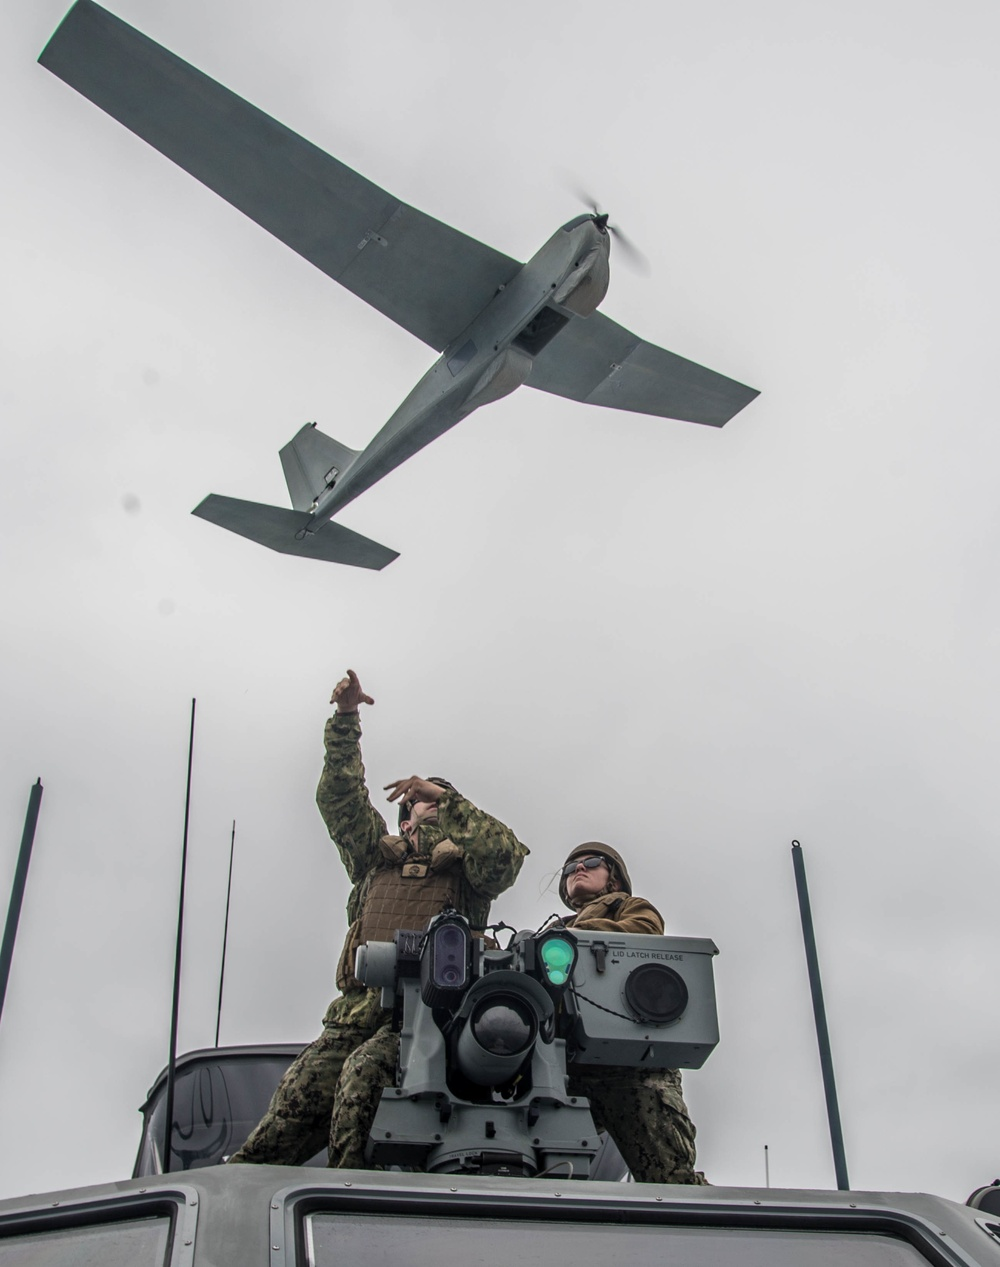 CRS 3 Mark VI Patrol Boats Underway during UAV Training Exercise